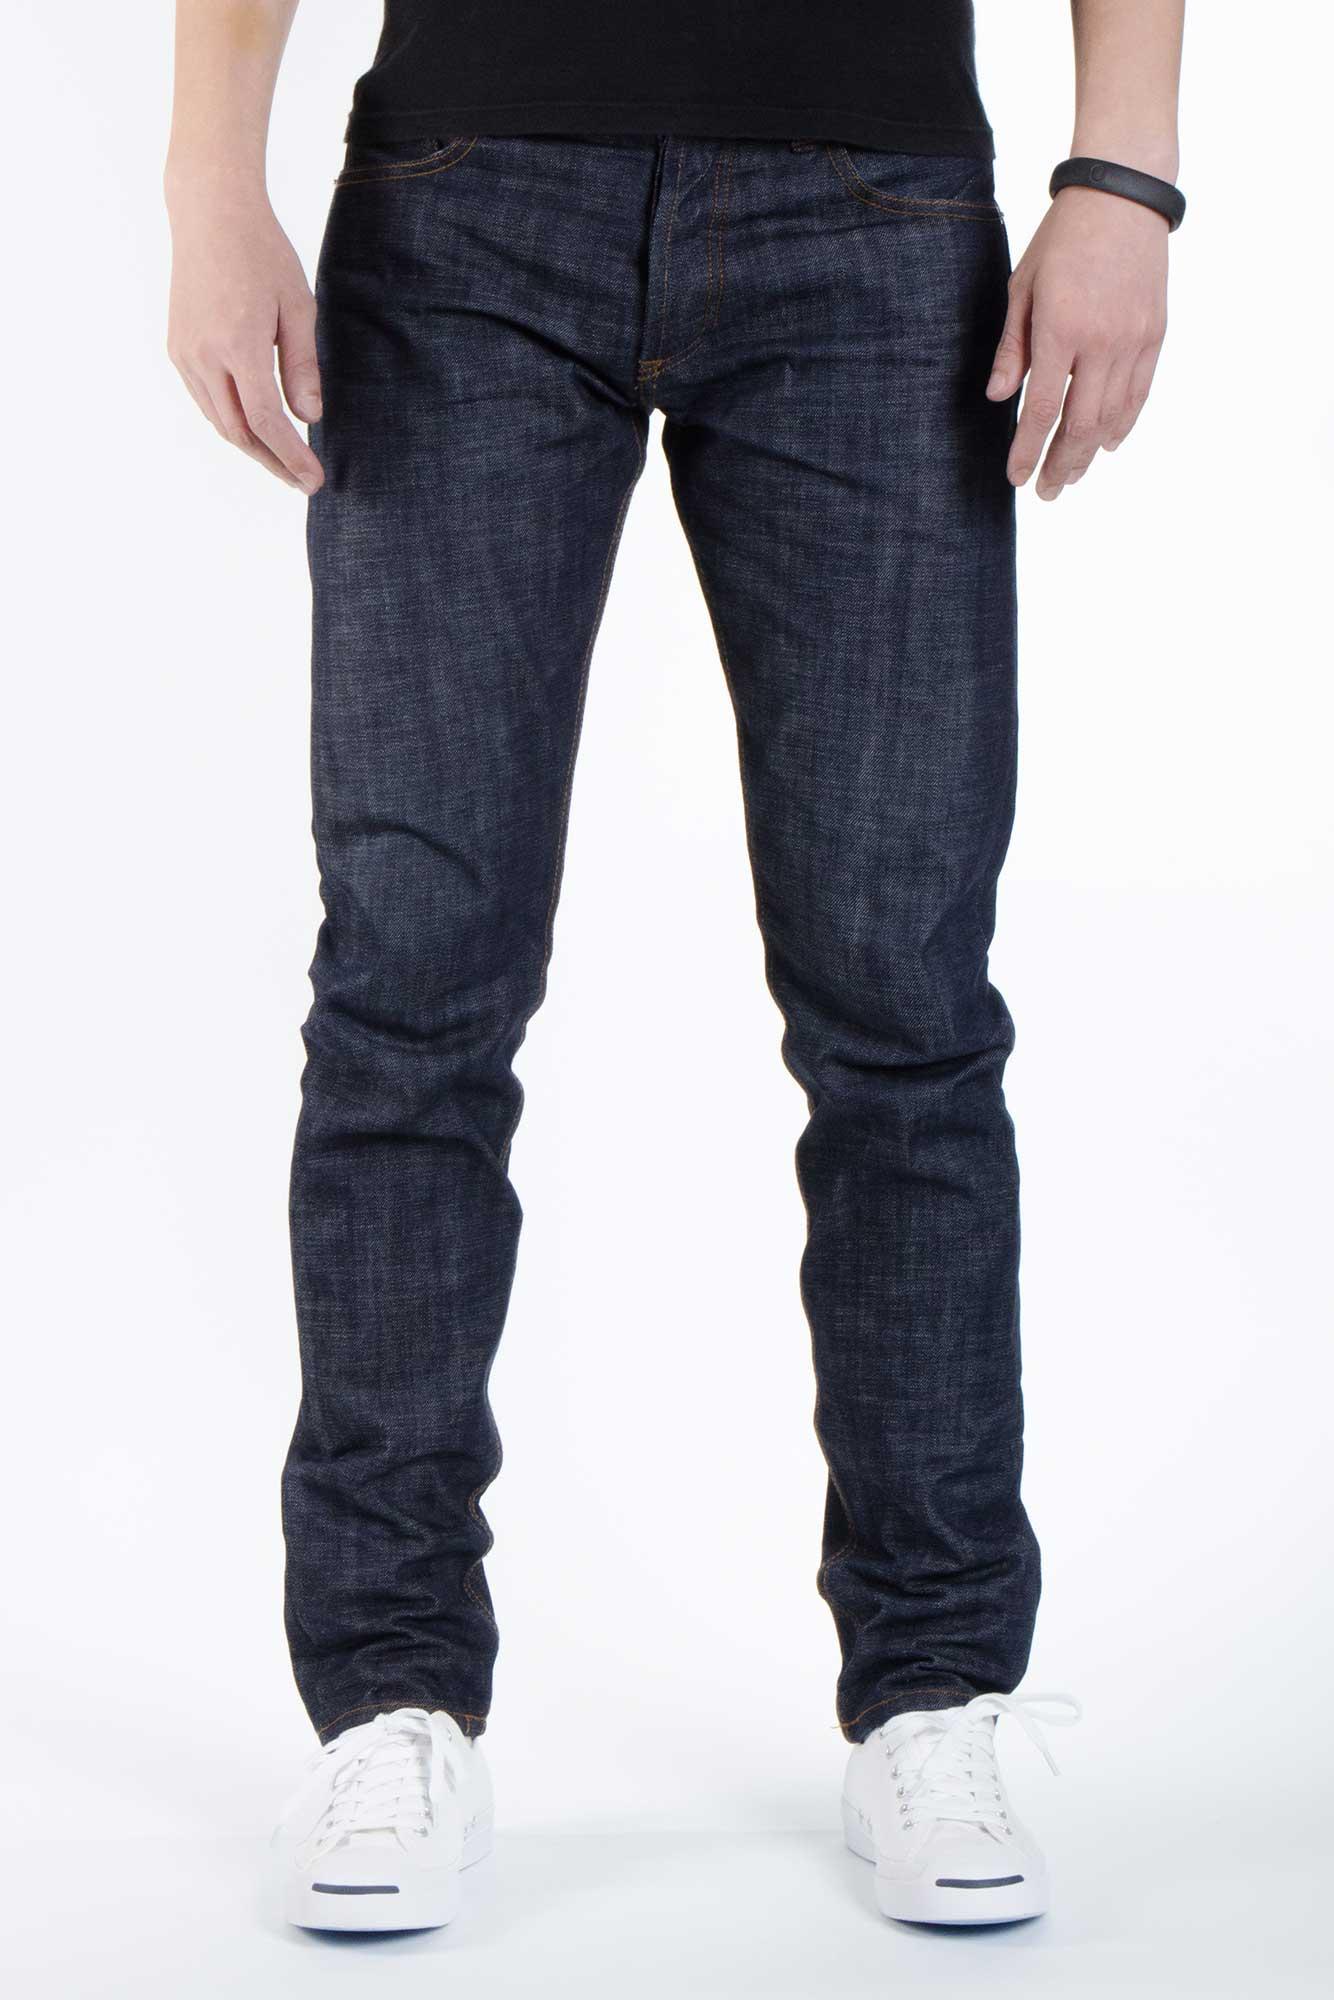 Trine Denimes Men Raw Denim Jeans Modern Slim fit Jeans